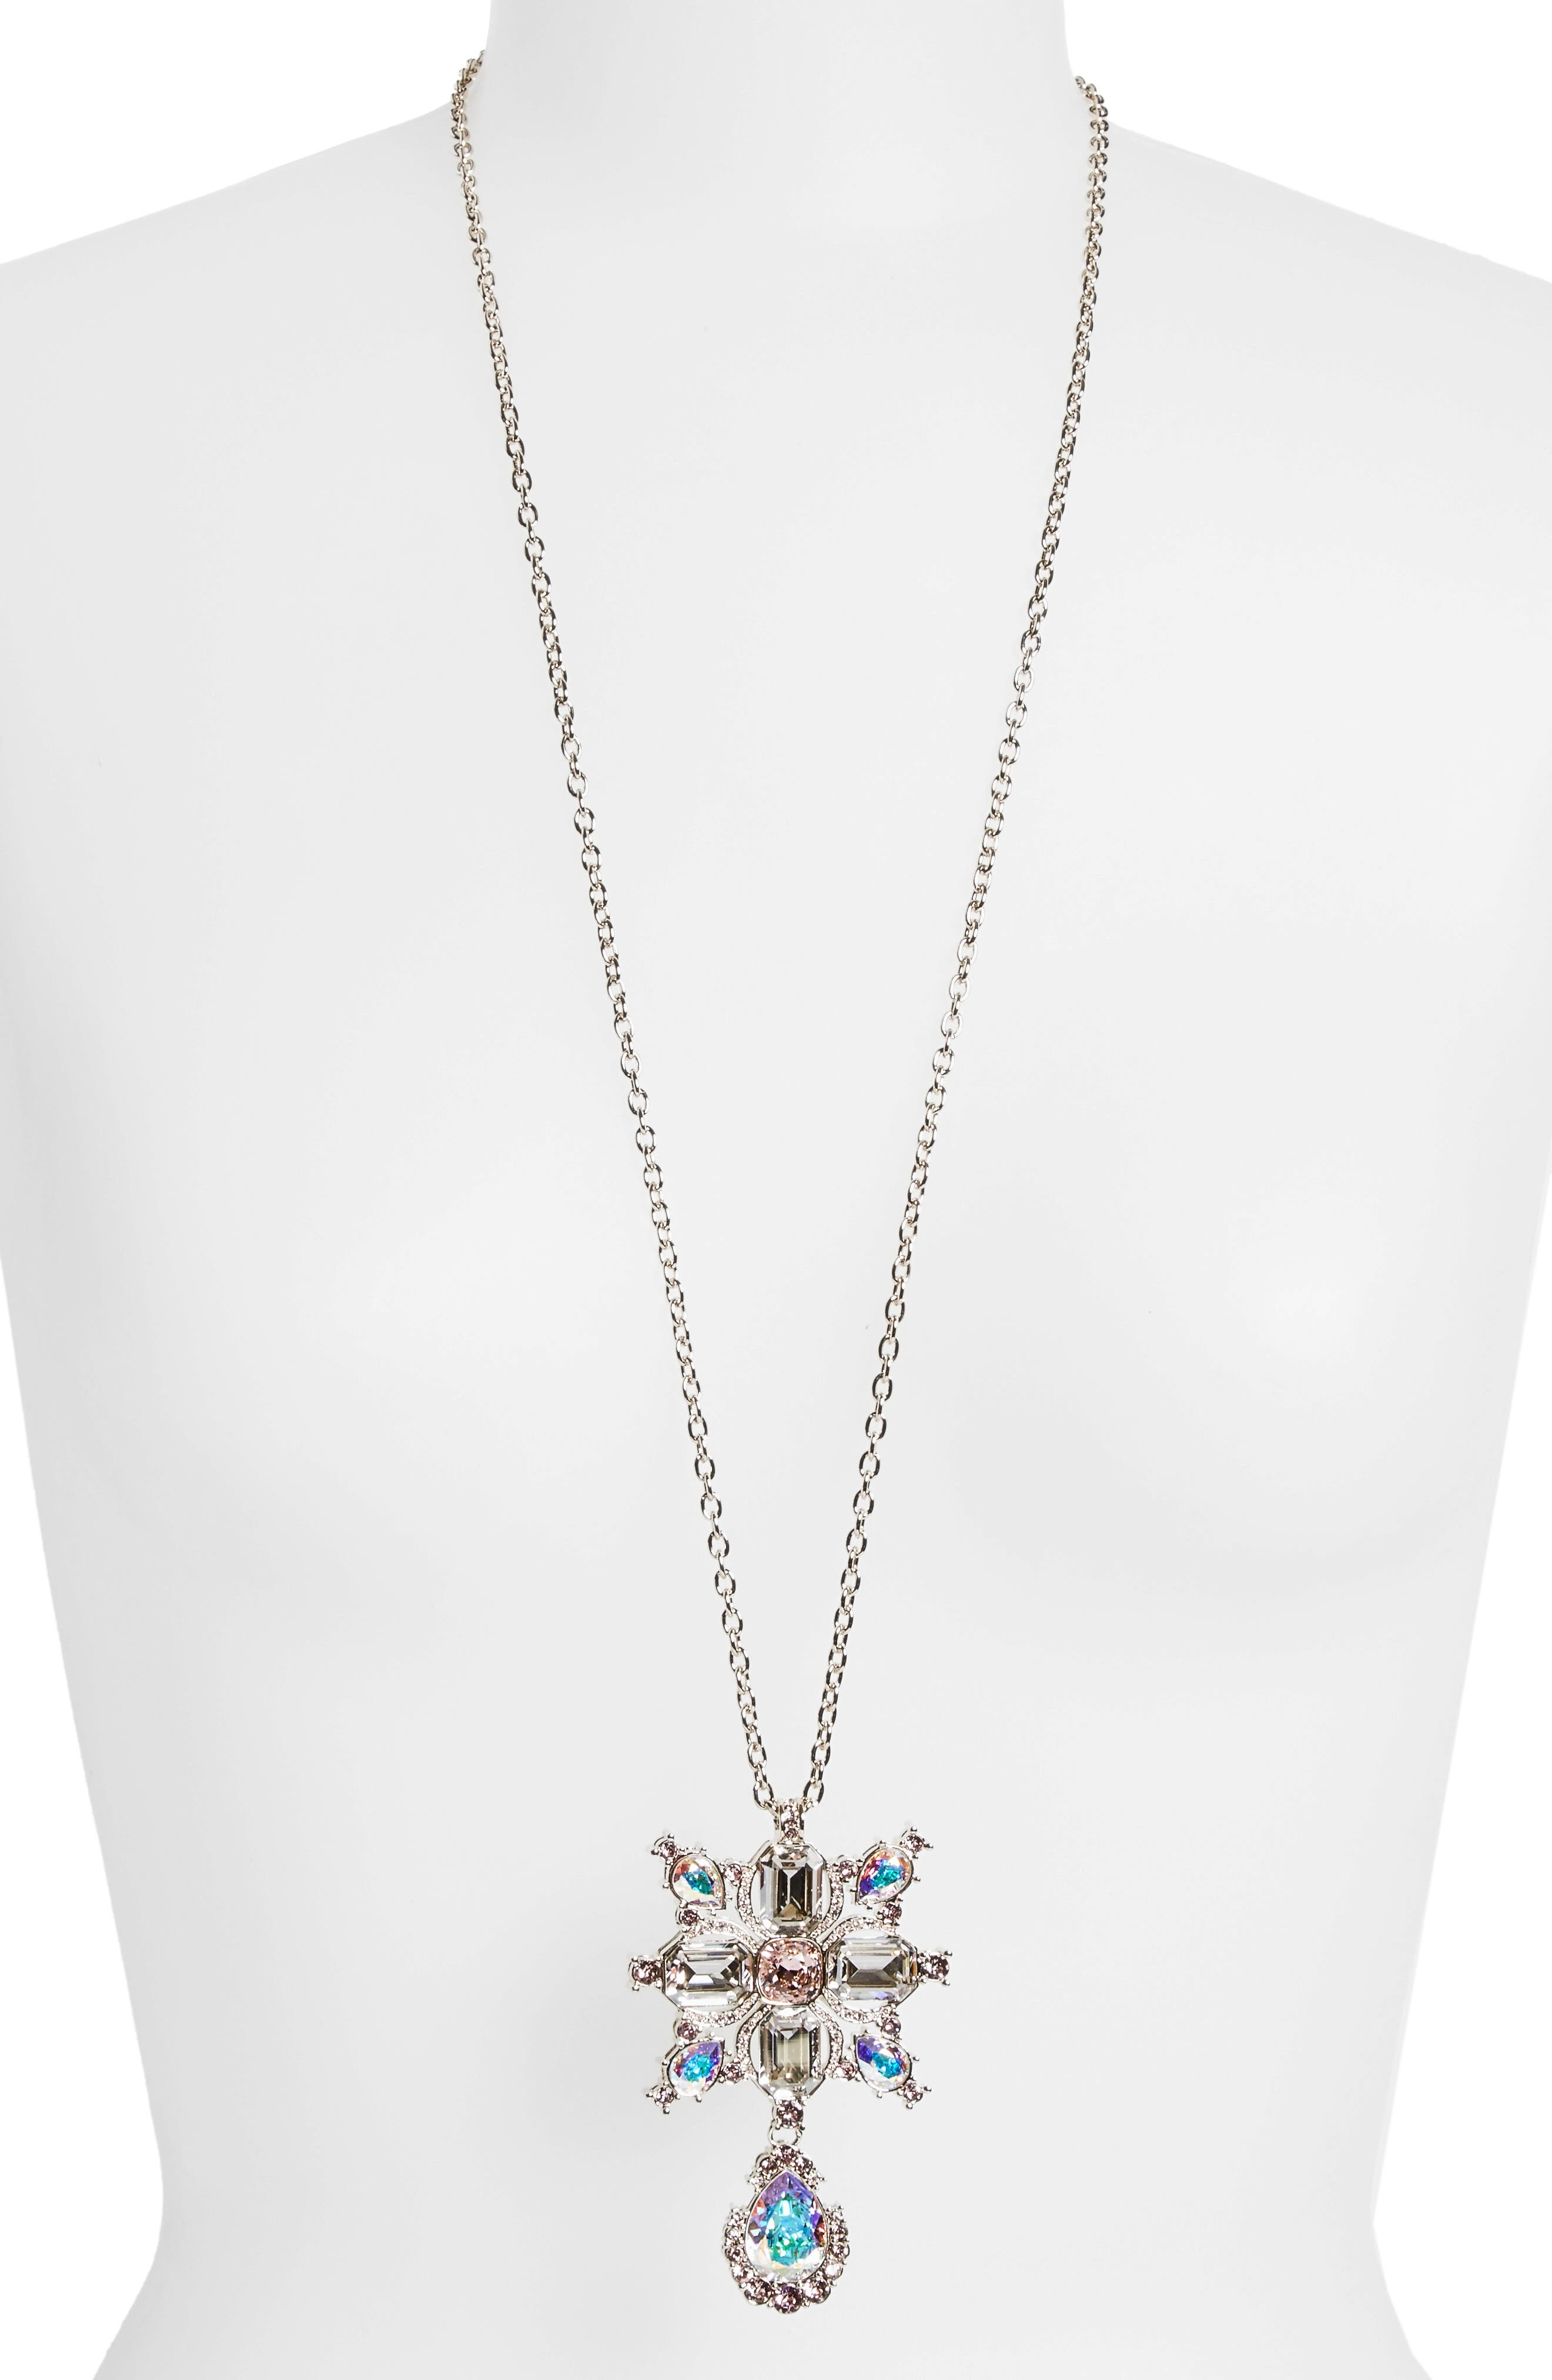 Swarovski Crystal Pendant Necklace,                             Alternate thumbnail 2, color,                             710